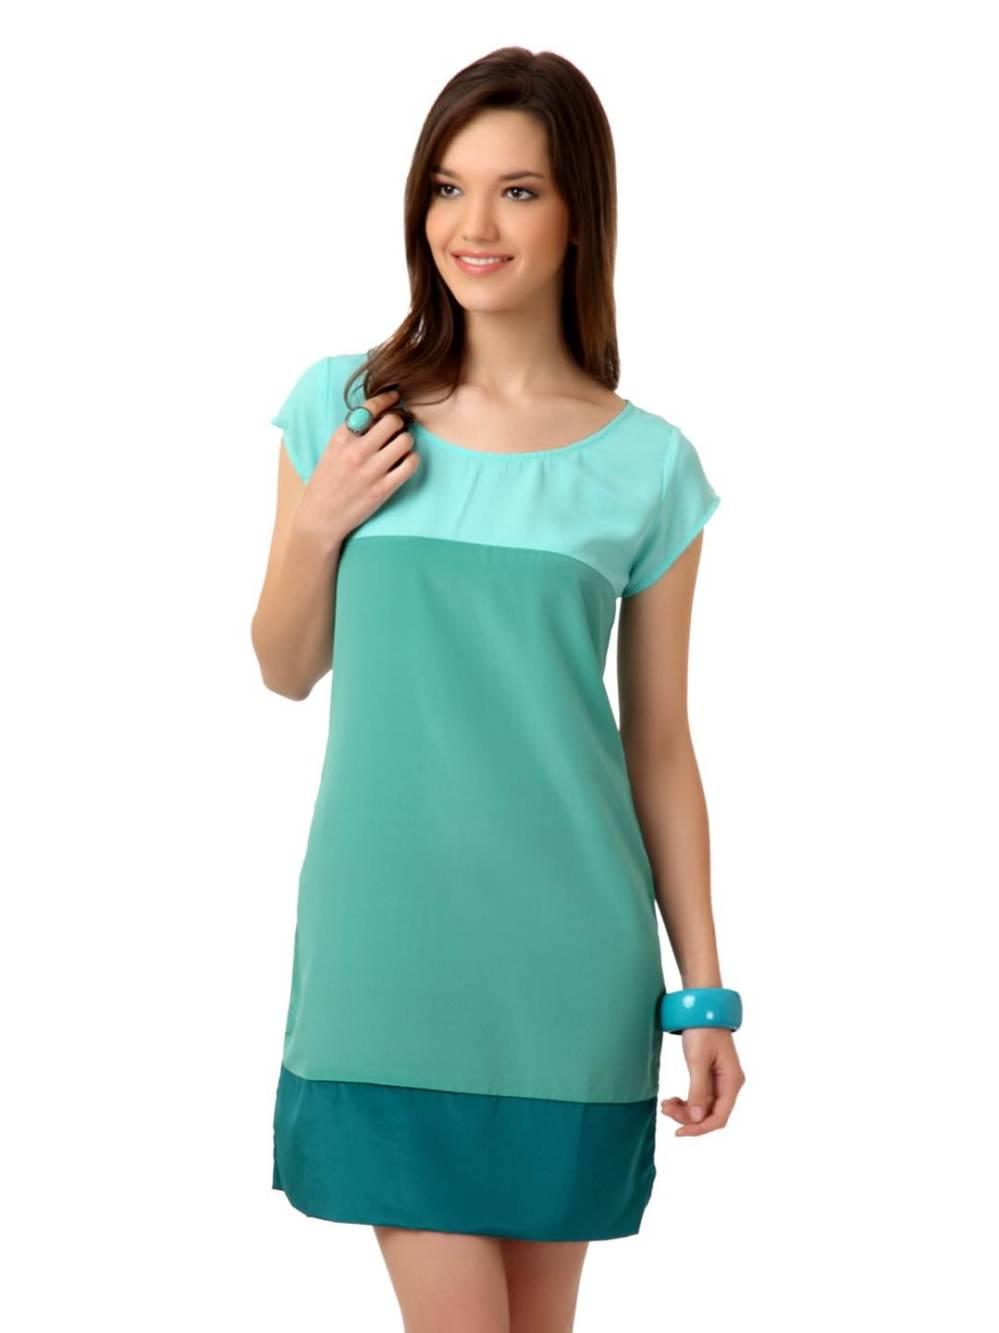 woman_green_dress